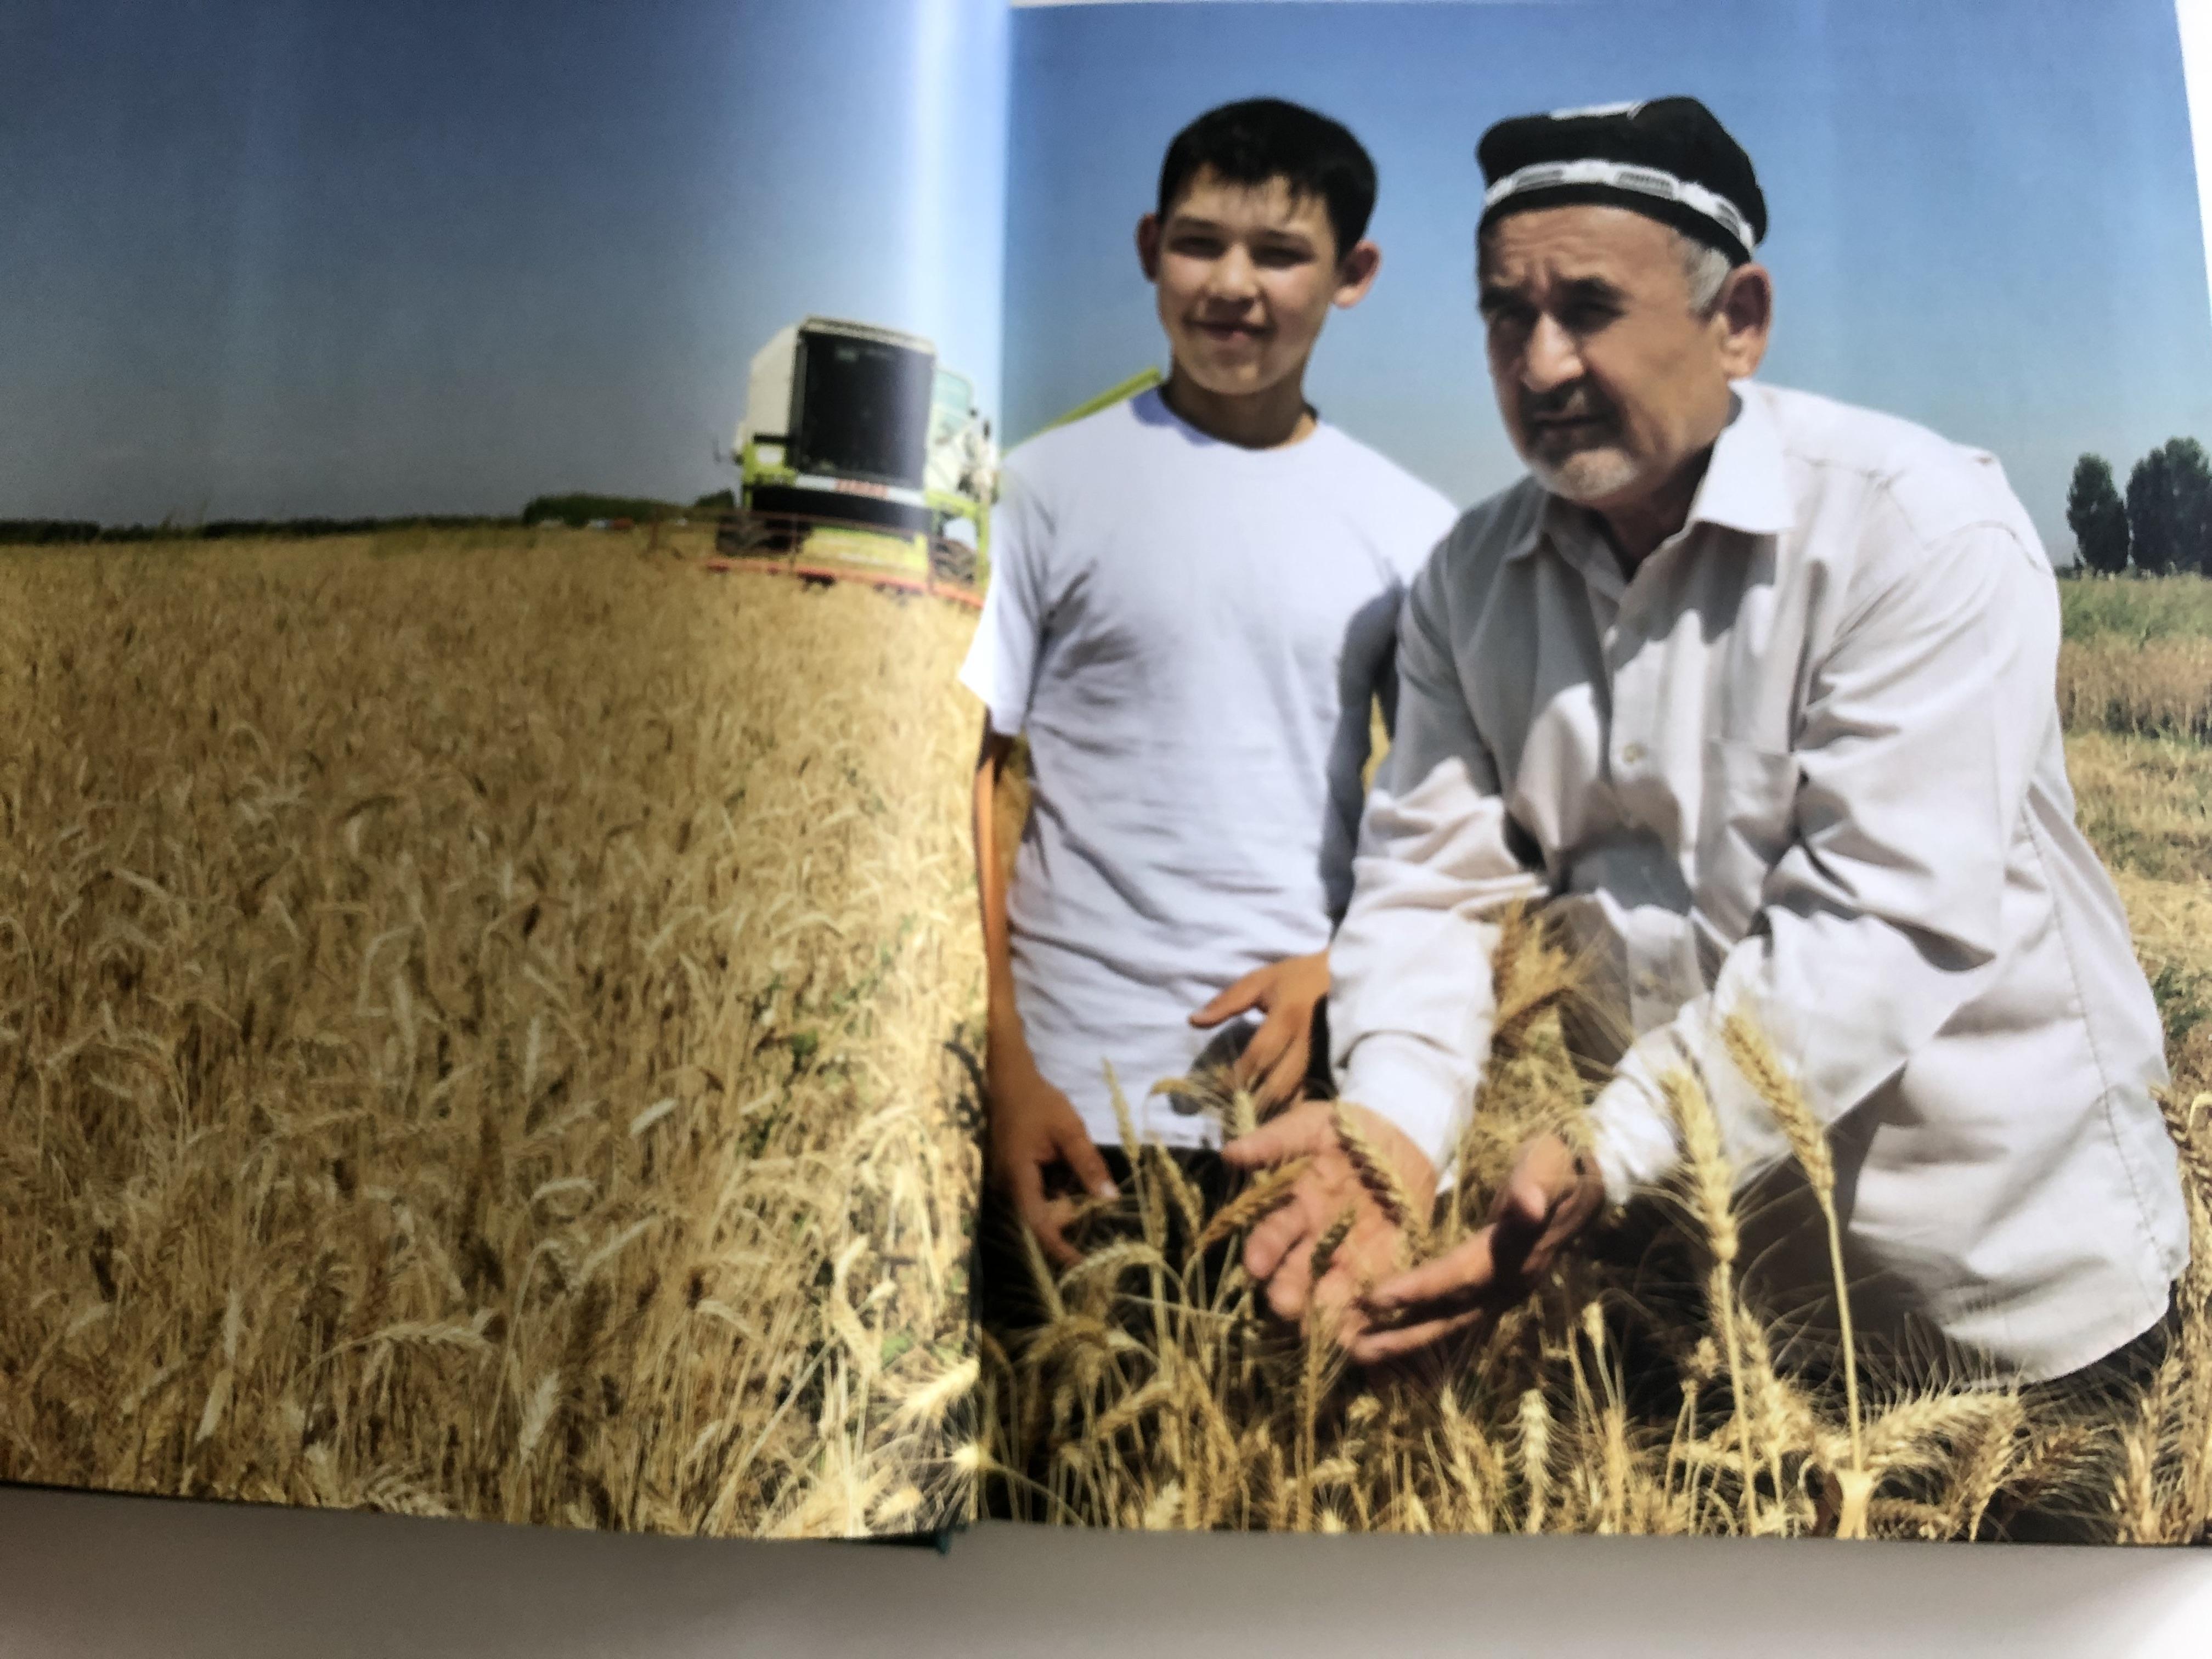 the-art-of-uzbek-cuisine-uzbek-russian-english-edition-hardcover-baktria-press-toshkent-2016-recipes-culture-cuisine-art-8-.jpg